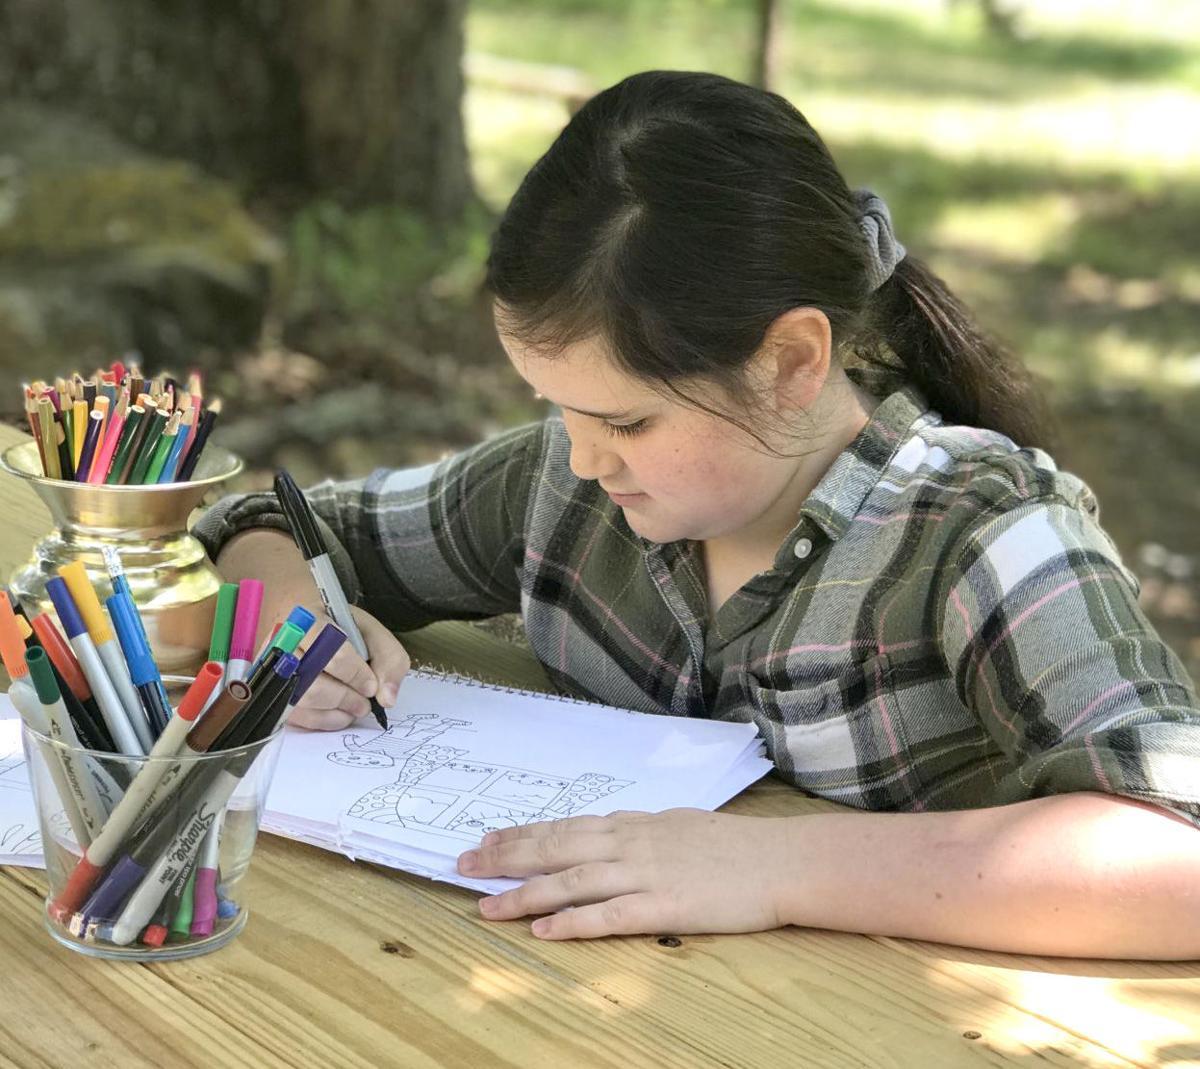 Miranda illustrating outdoors